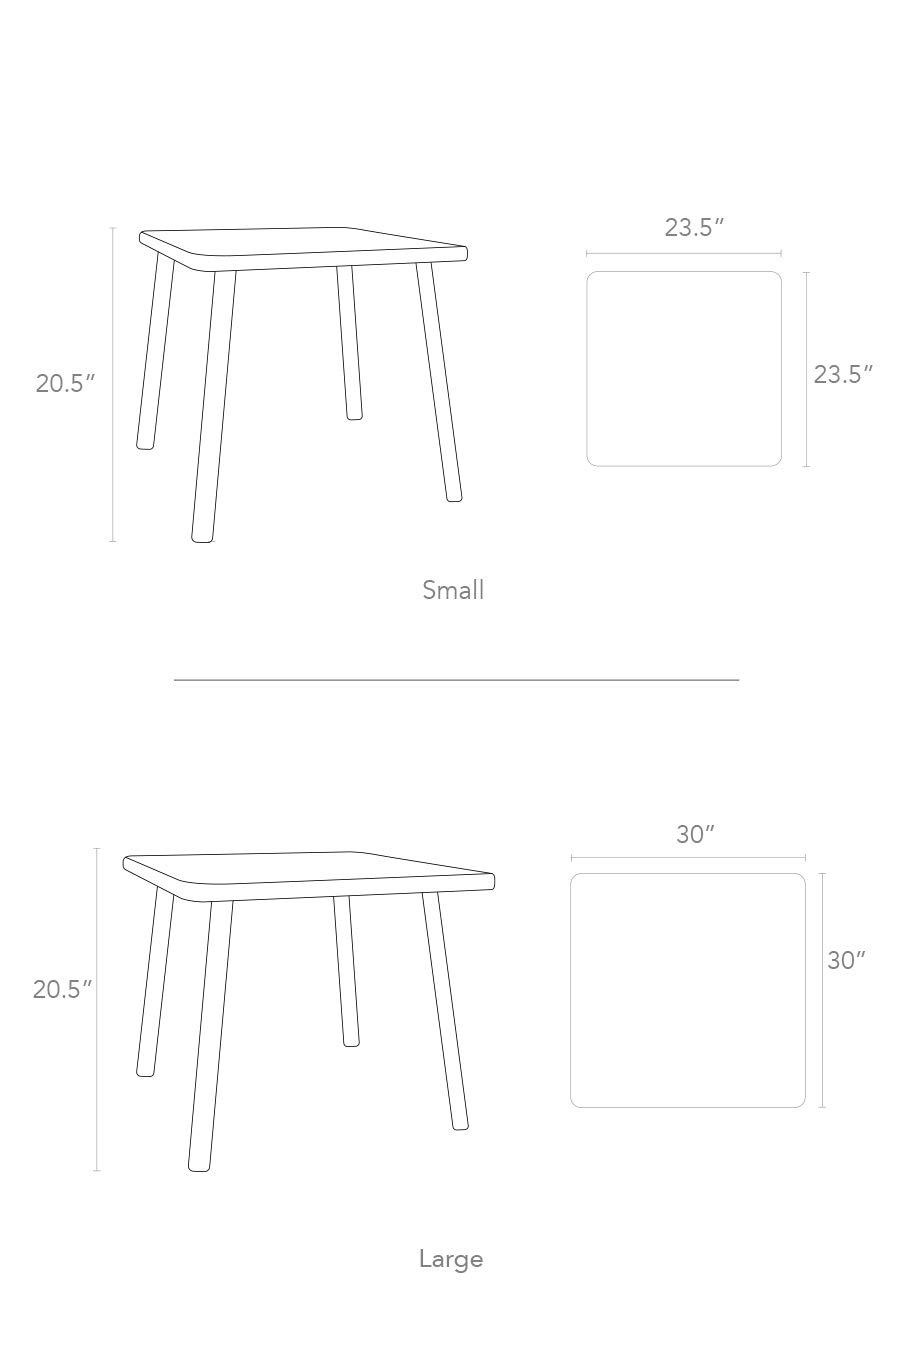 Amazon.com: Nico & Yeye Tippy Toe - Mesa cuadrada para niños ...